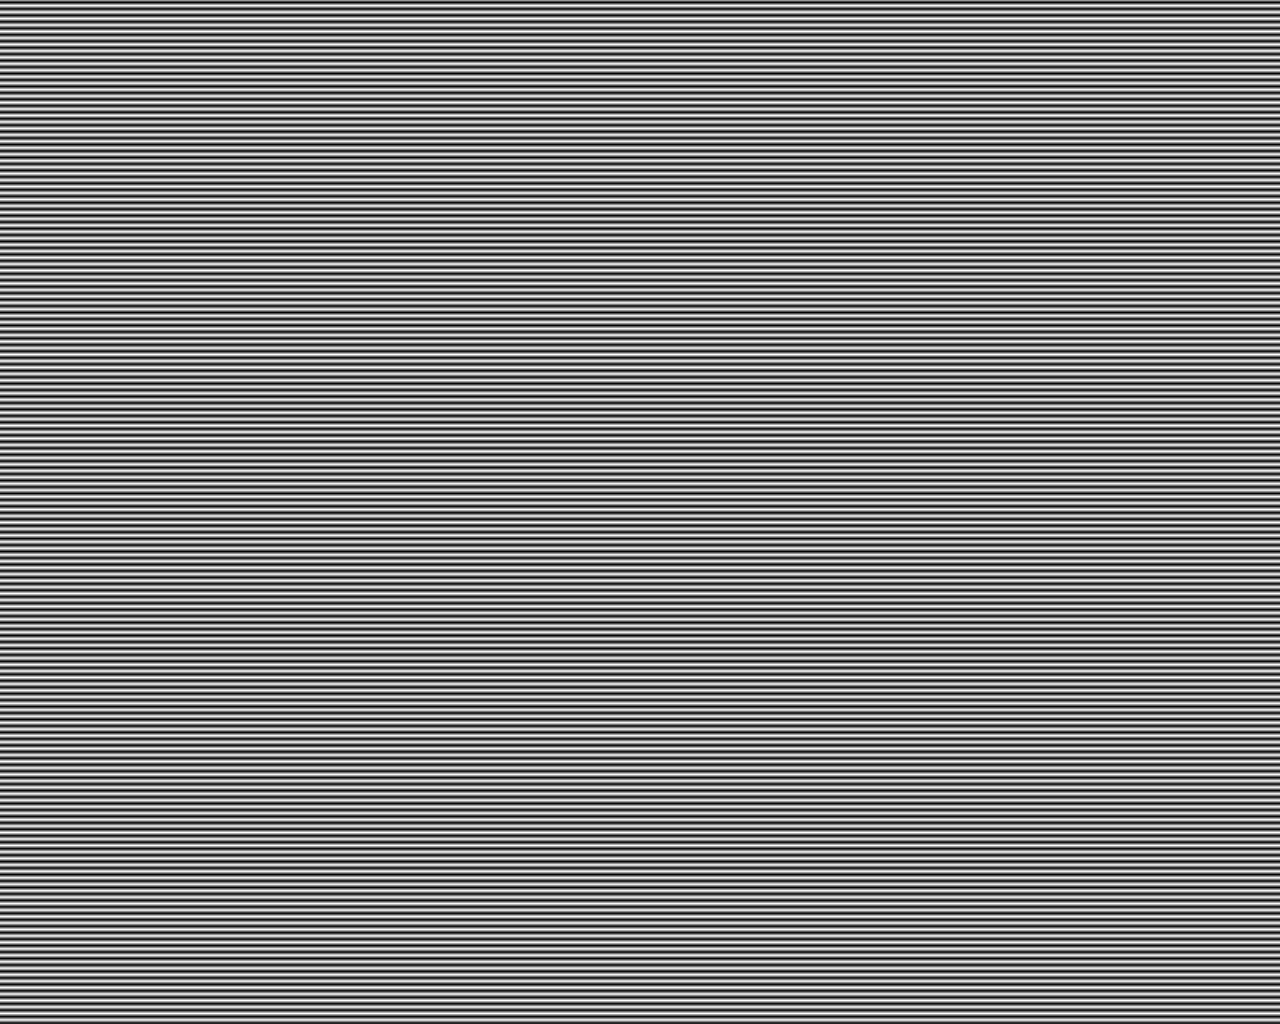 Scanlines Namantuts Jpg Screentone Overlays Transparent Overlays Tumblr